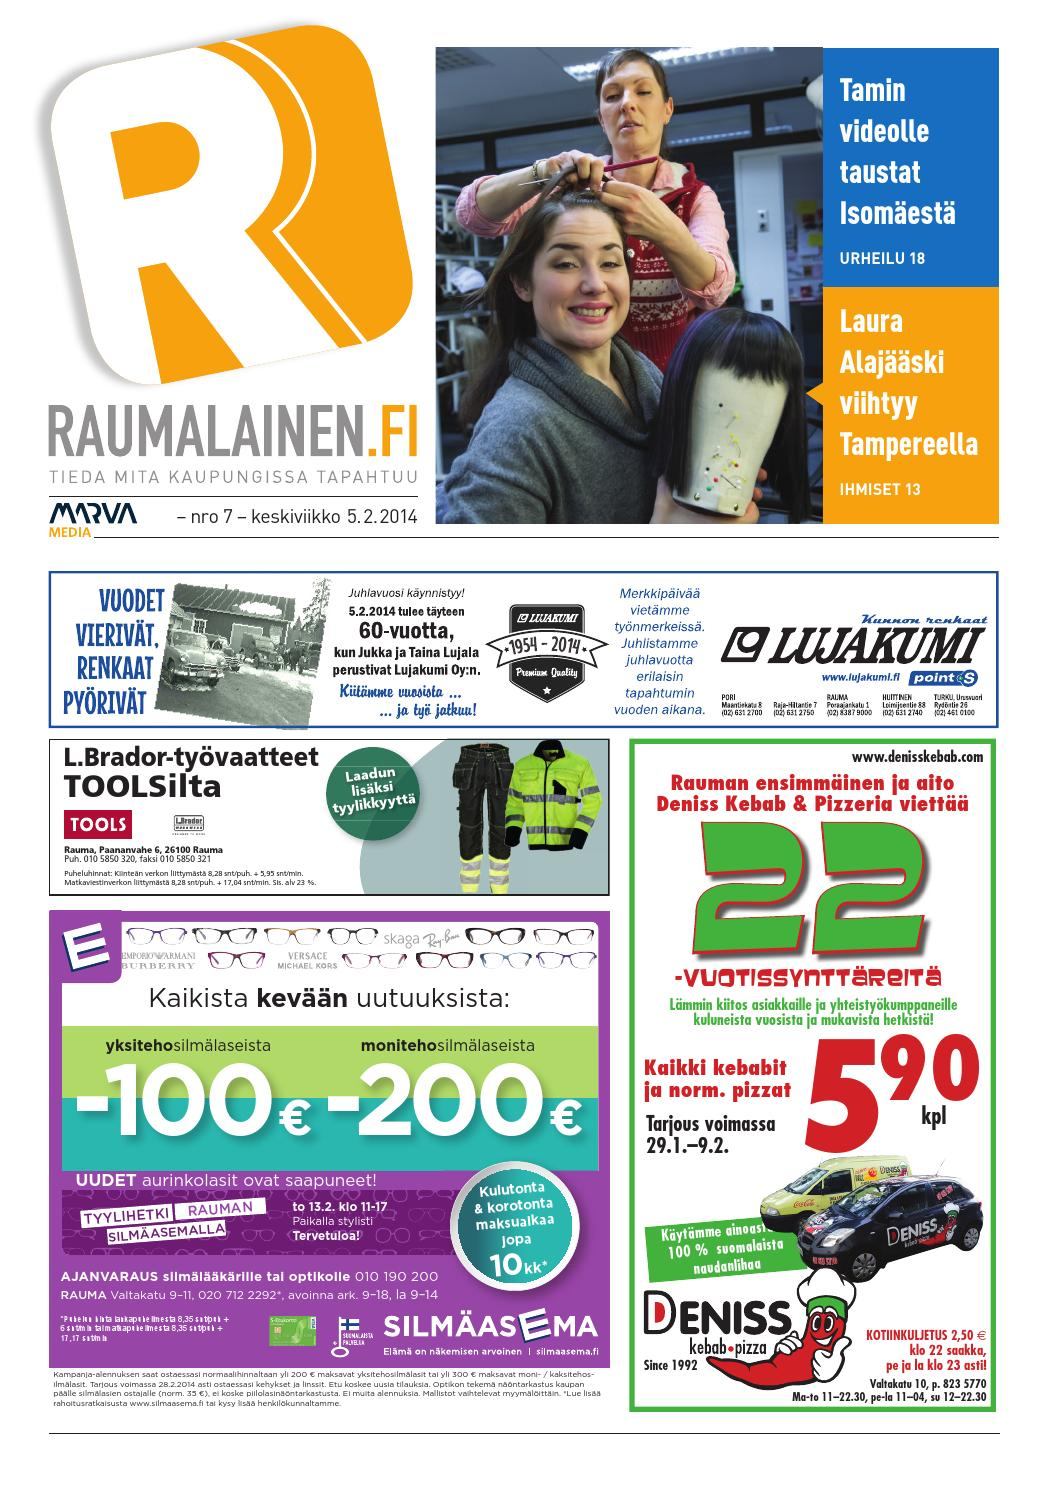 Raumalainen 5 2 2014 by Marva Group - issuu 83cce50c9d